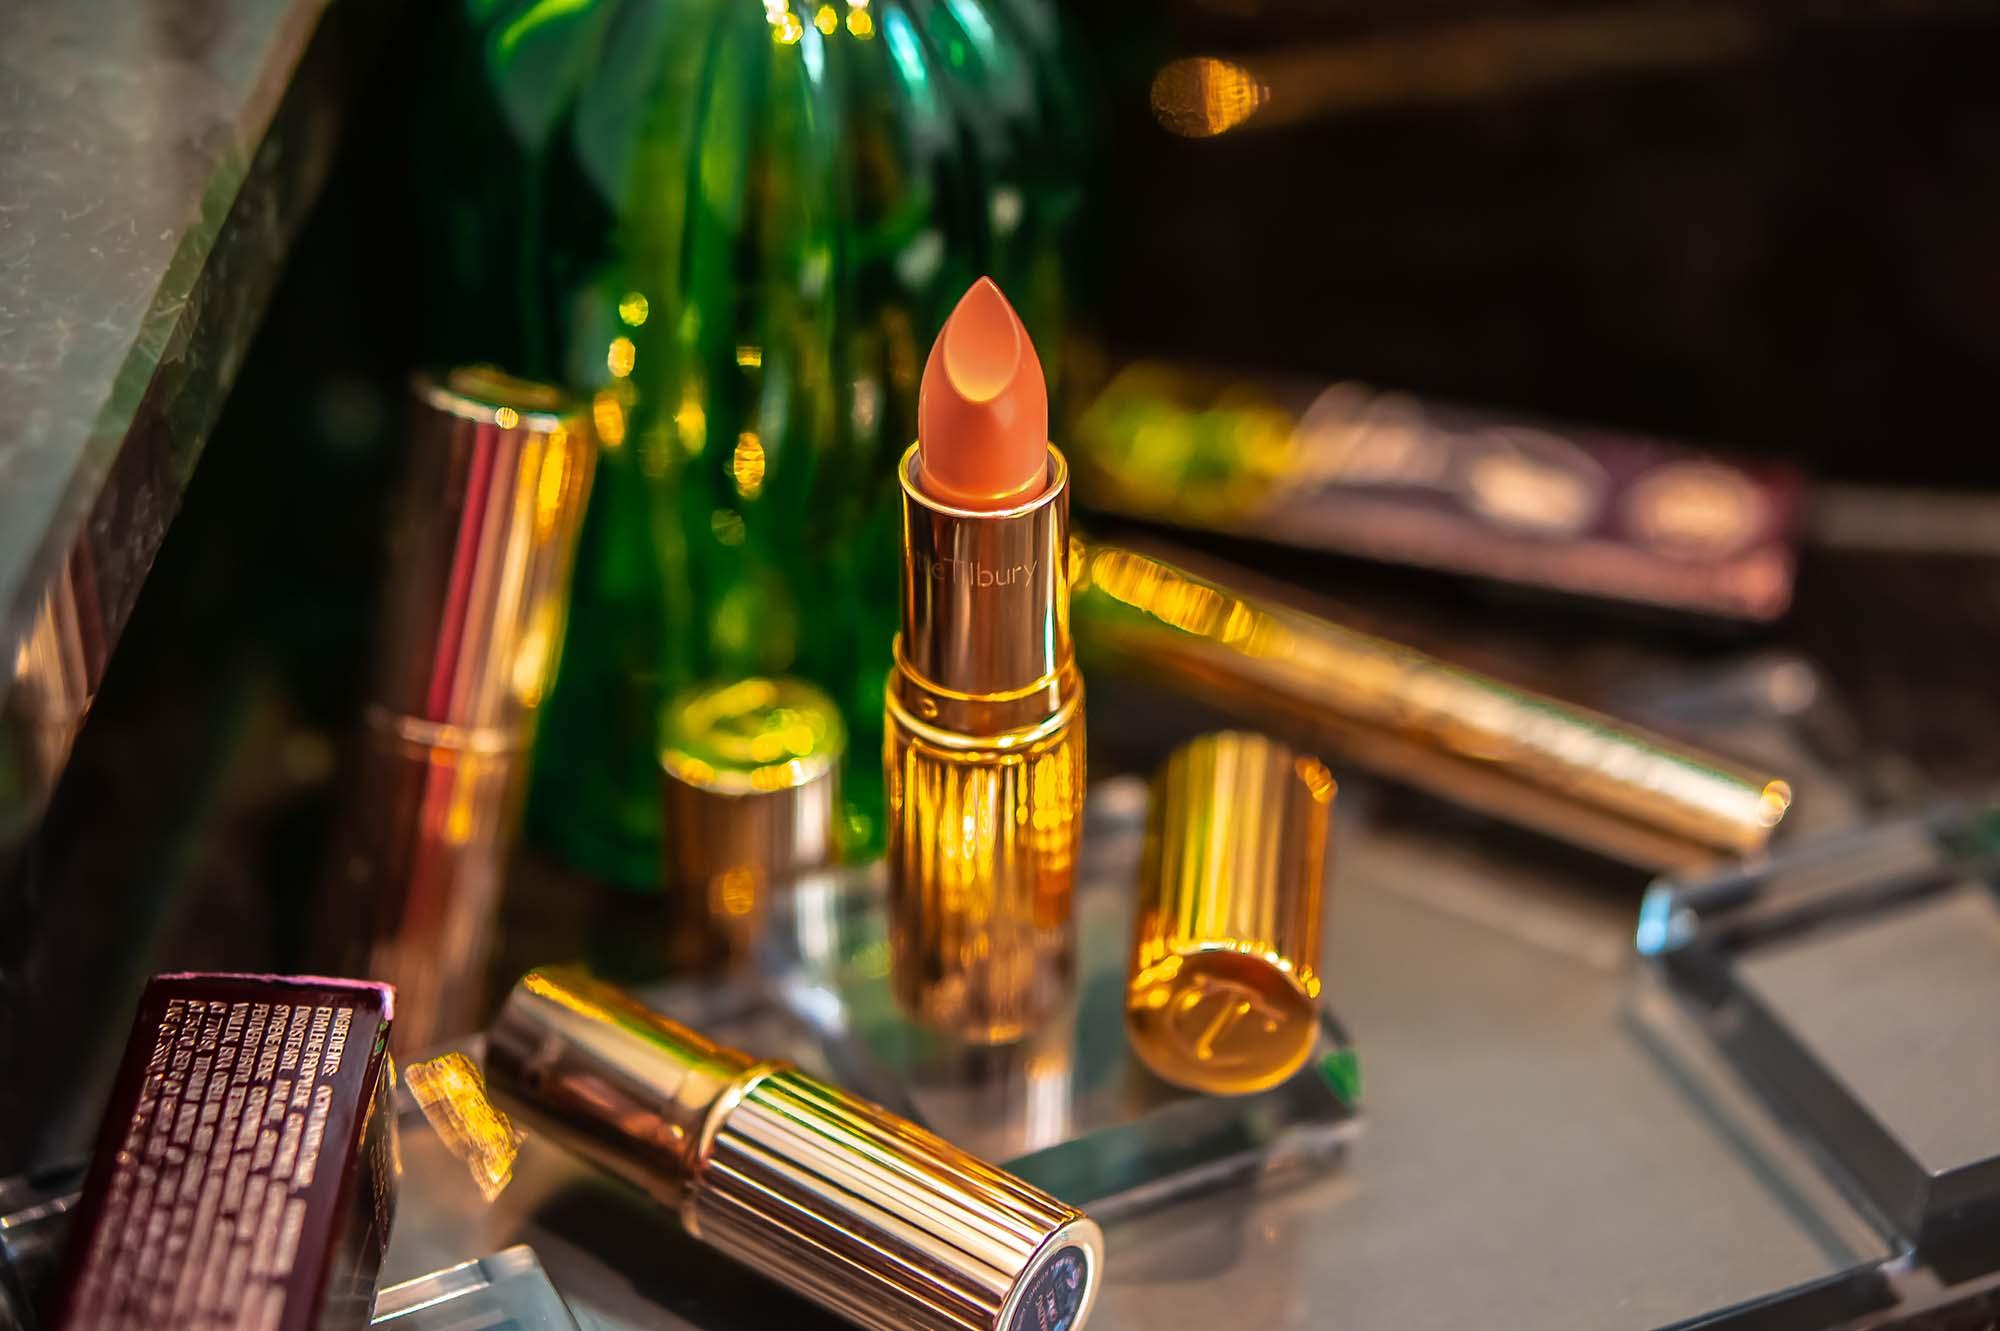 Bitch Perfect Charlotte Tilbury lipstick Kissing Lippenstift помада make-up